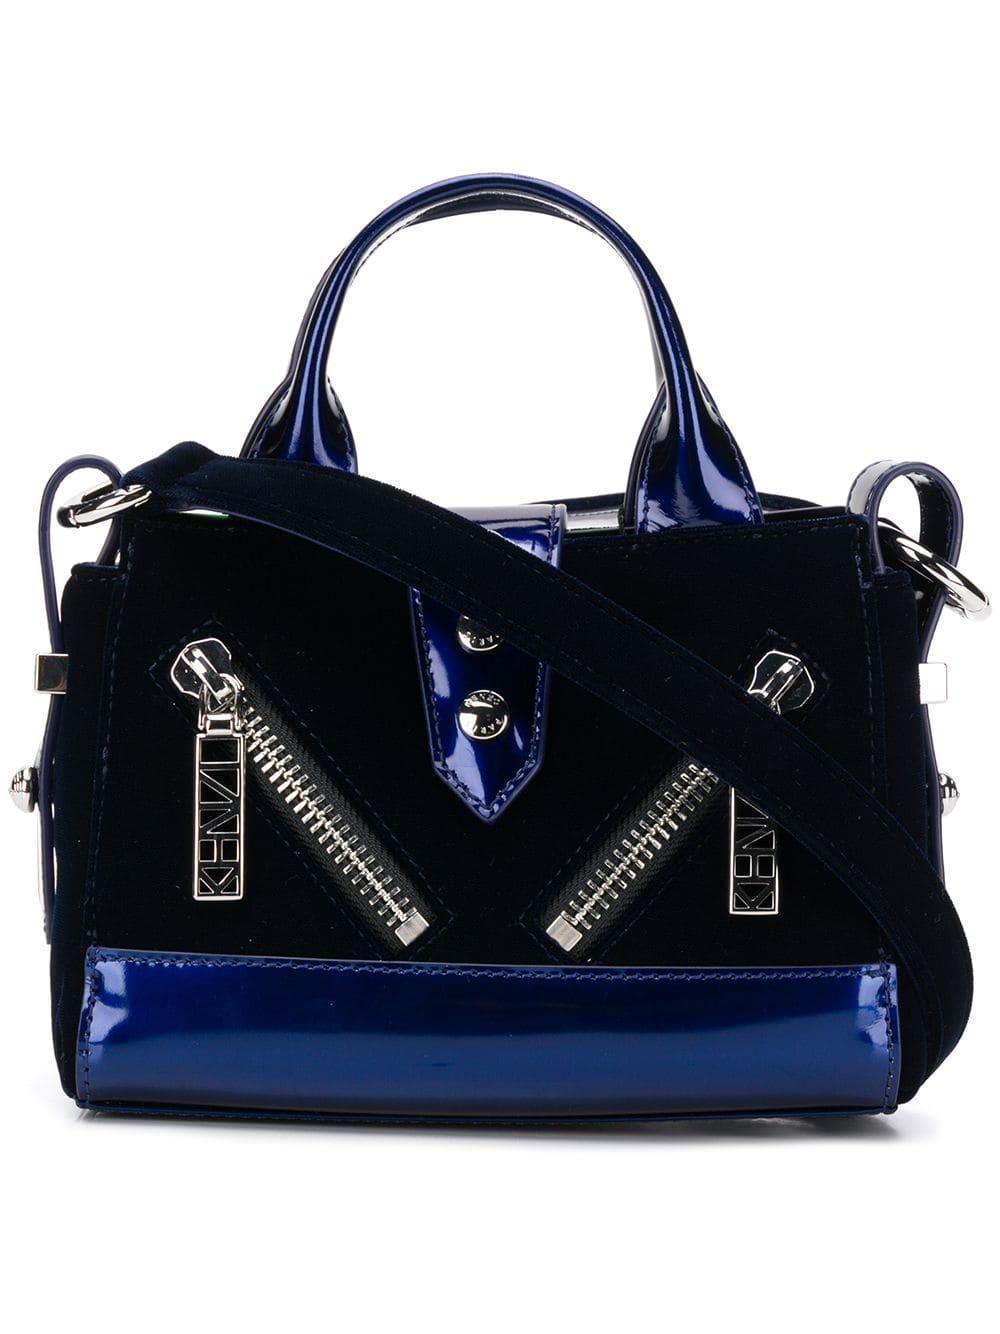 062ba7f4 Lyst - KENZO Micro Kalifornia Handbag in Blue - Save 13%